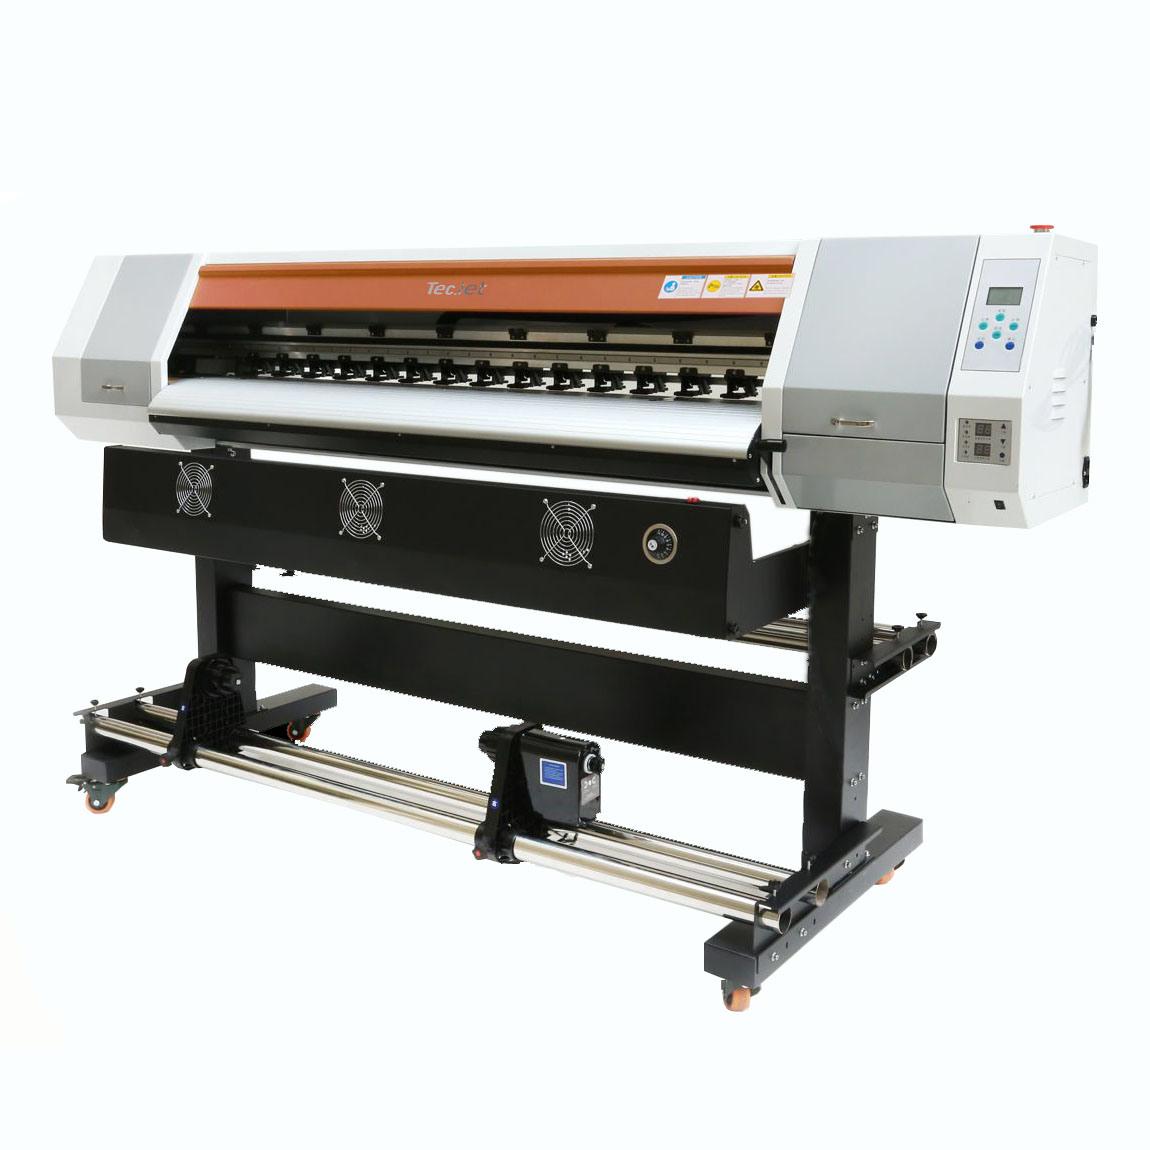 Sublimation Printer For T Shirt Printing - Nils Stucki